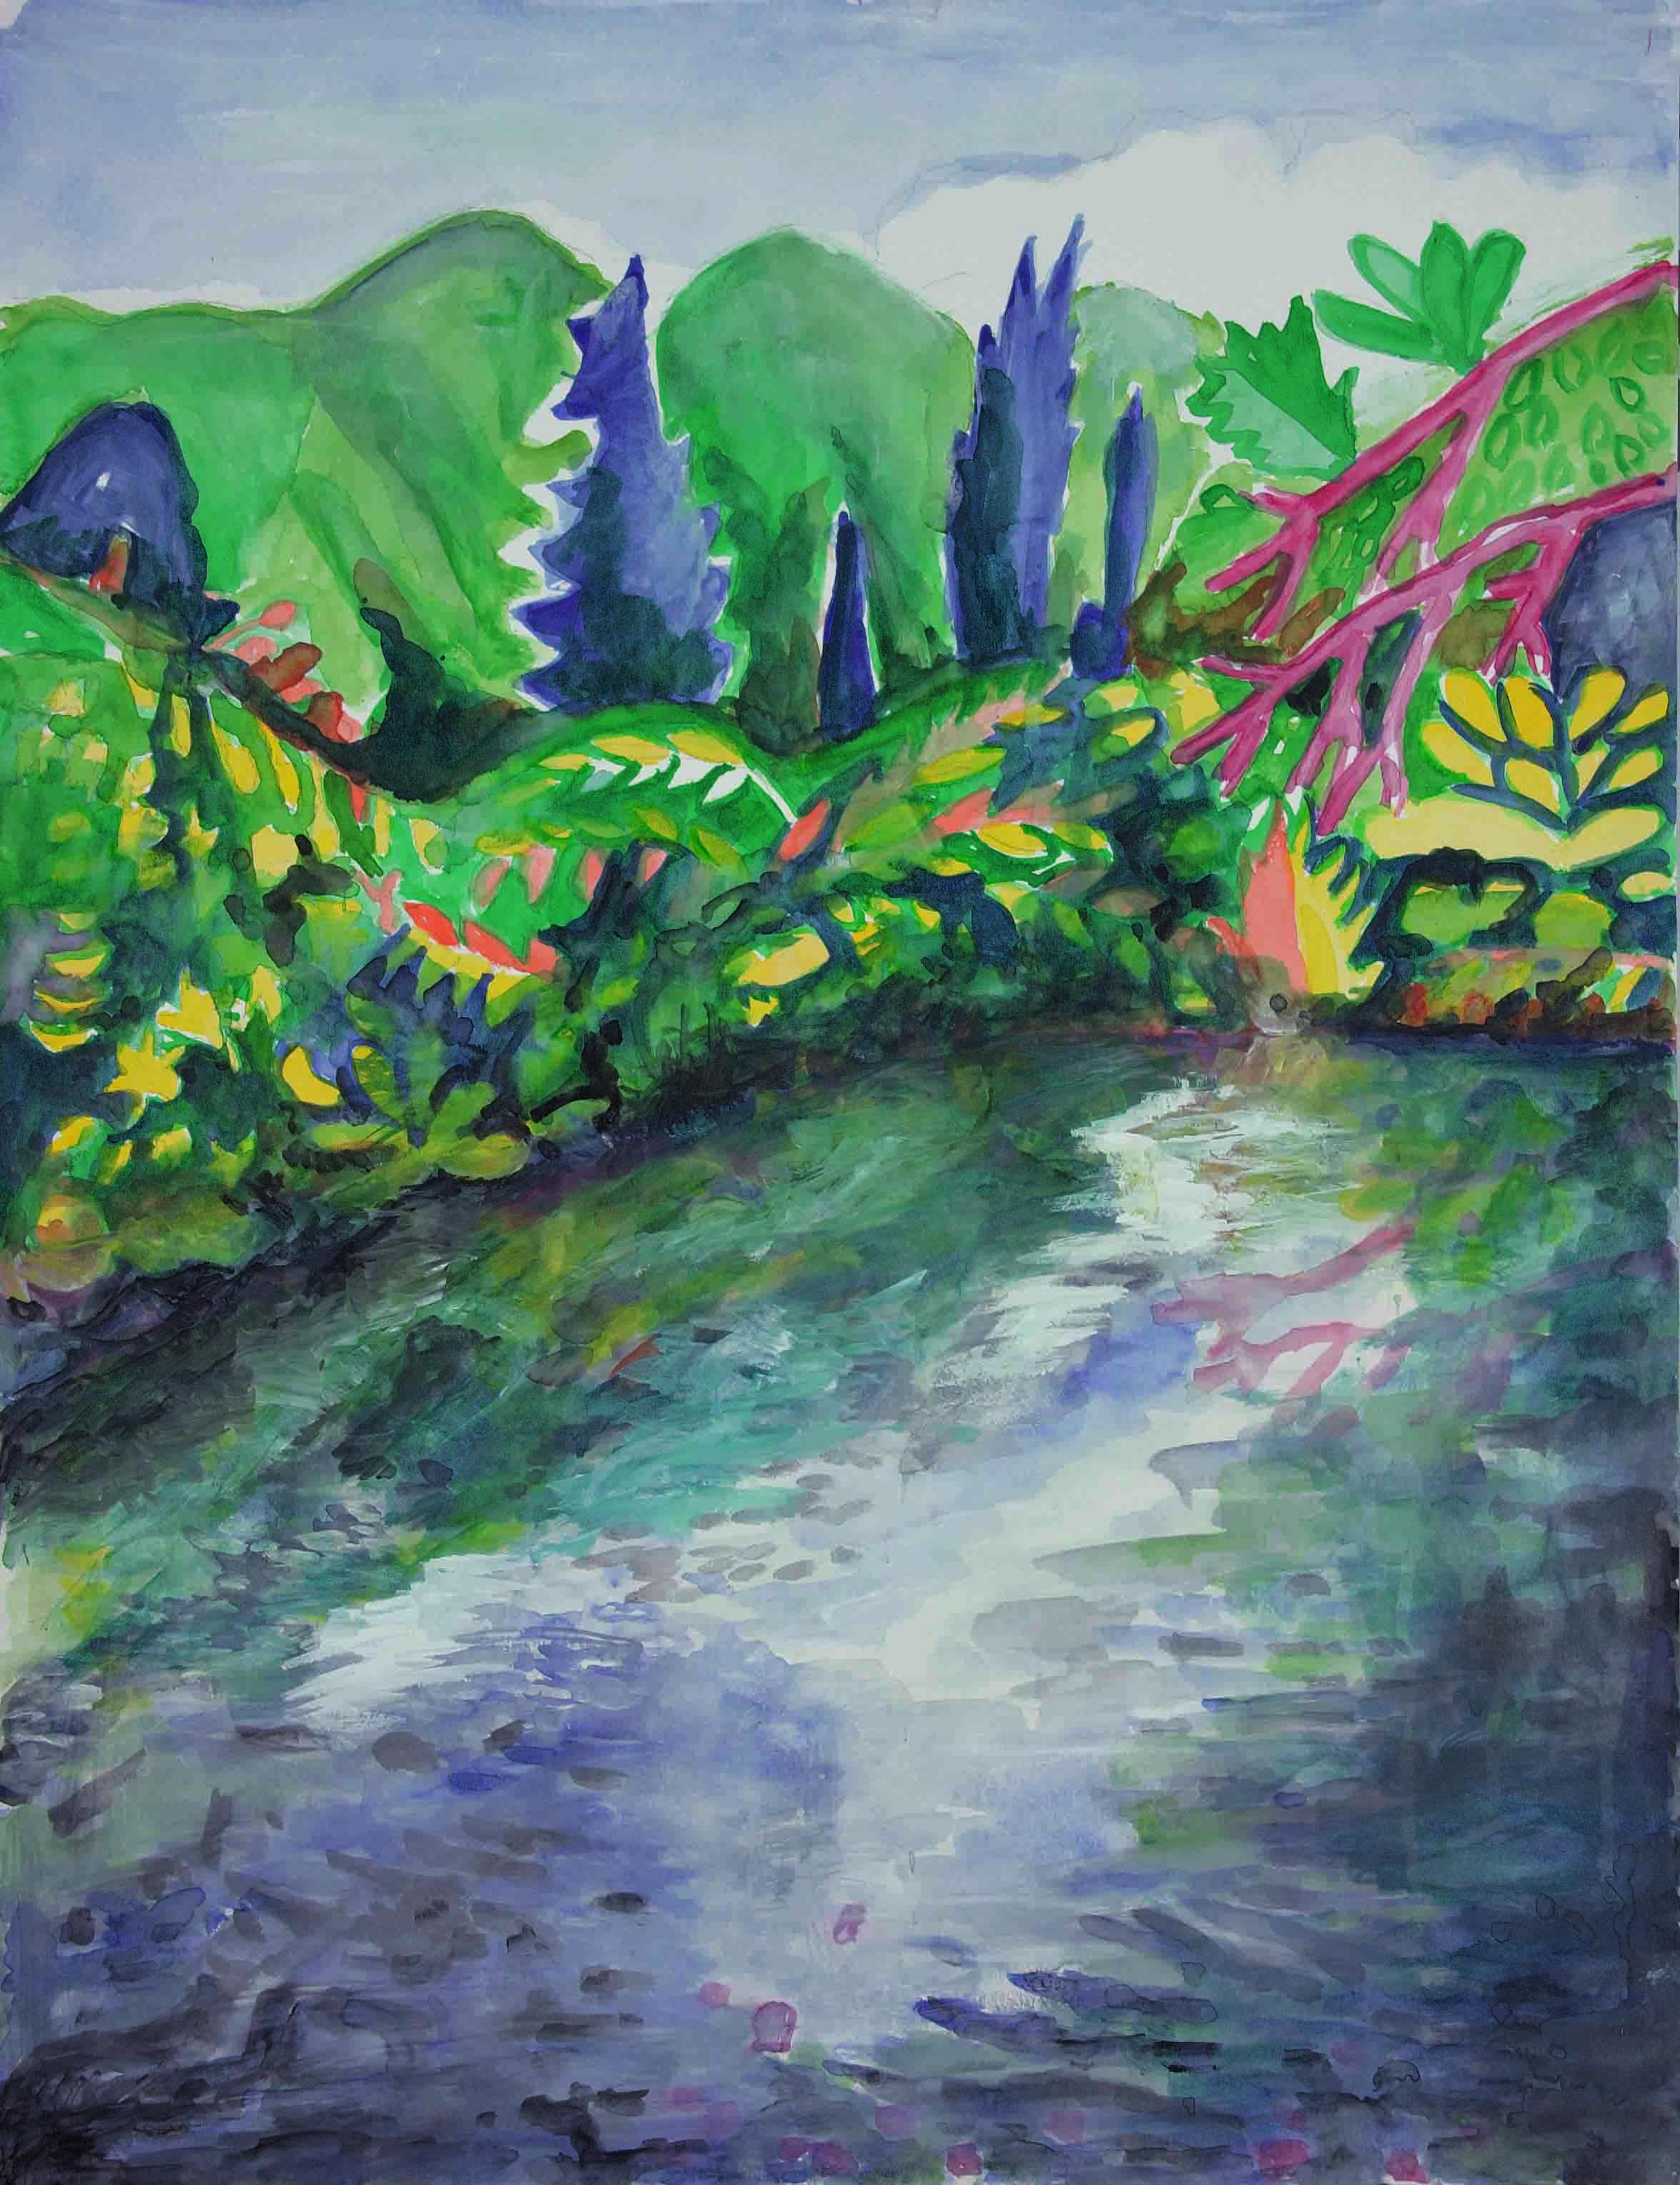 10 Giugno 2017, Aquarell auf Papier, 55 x 46 cm, Courtesy: hilleckes probst galerie